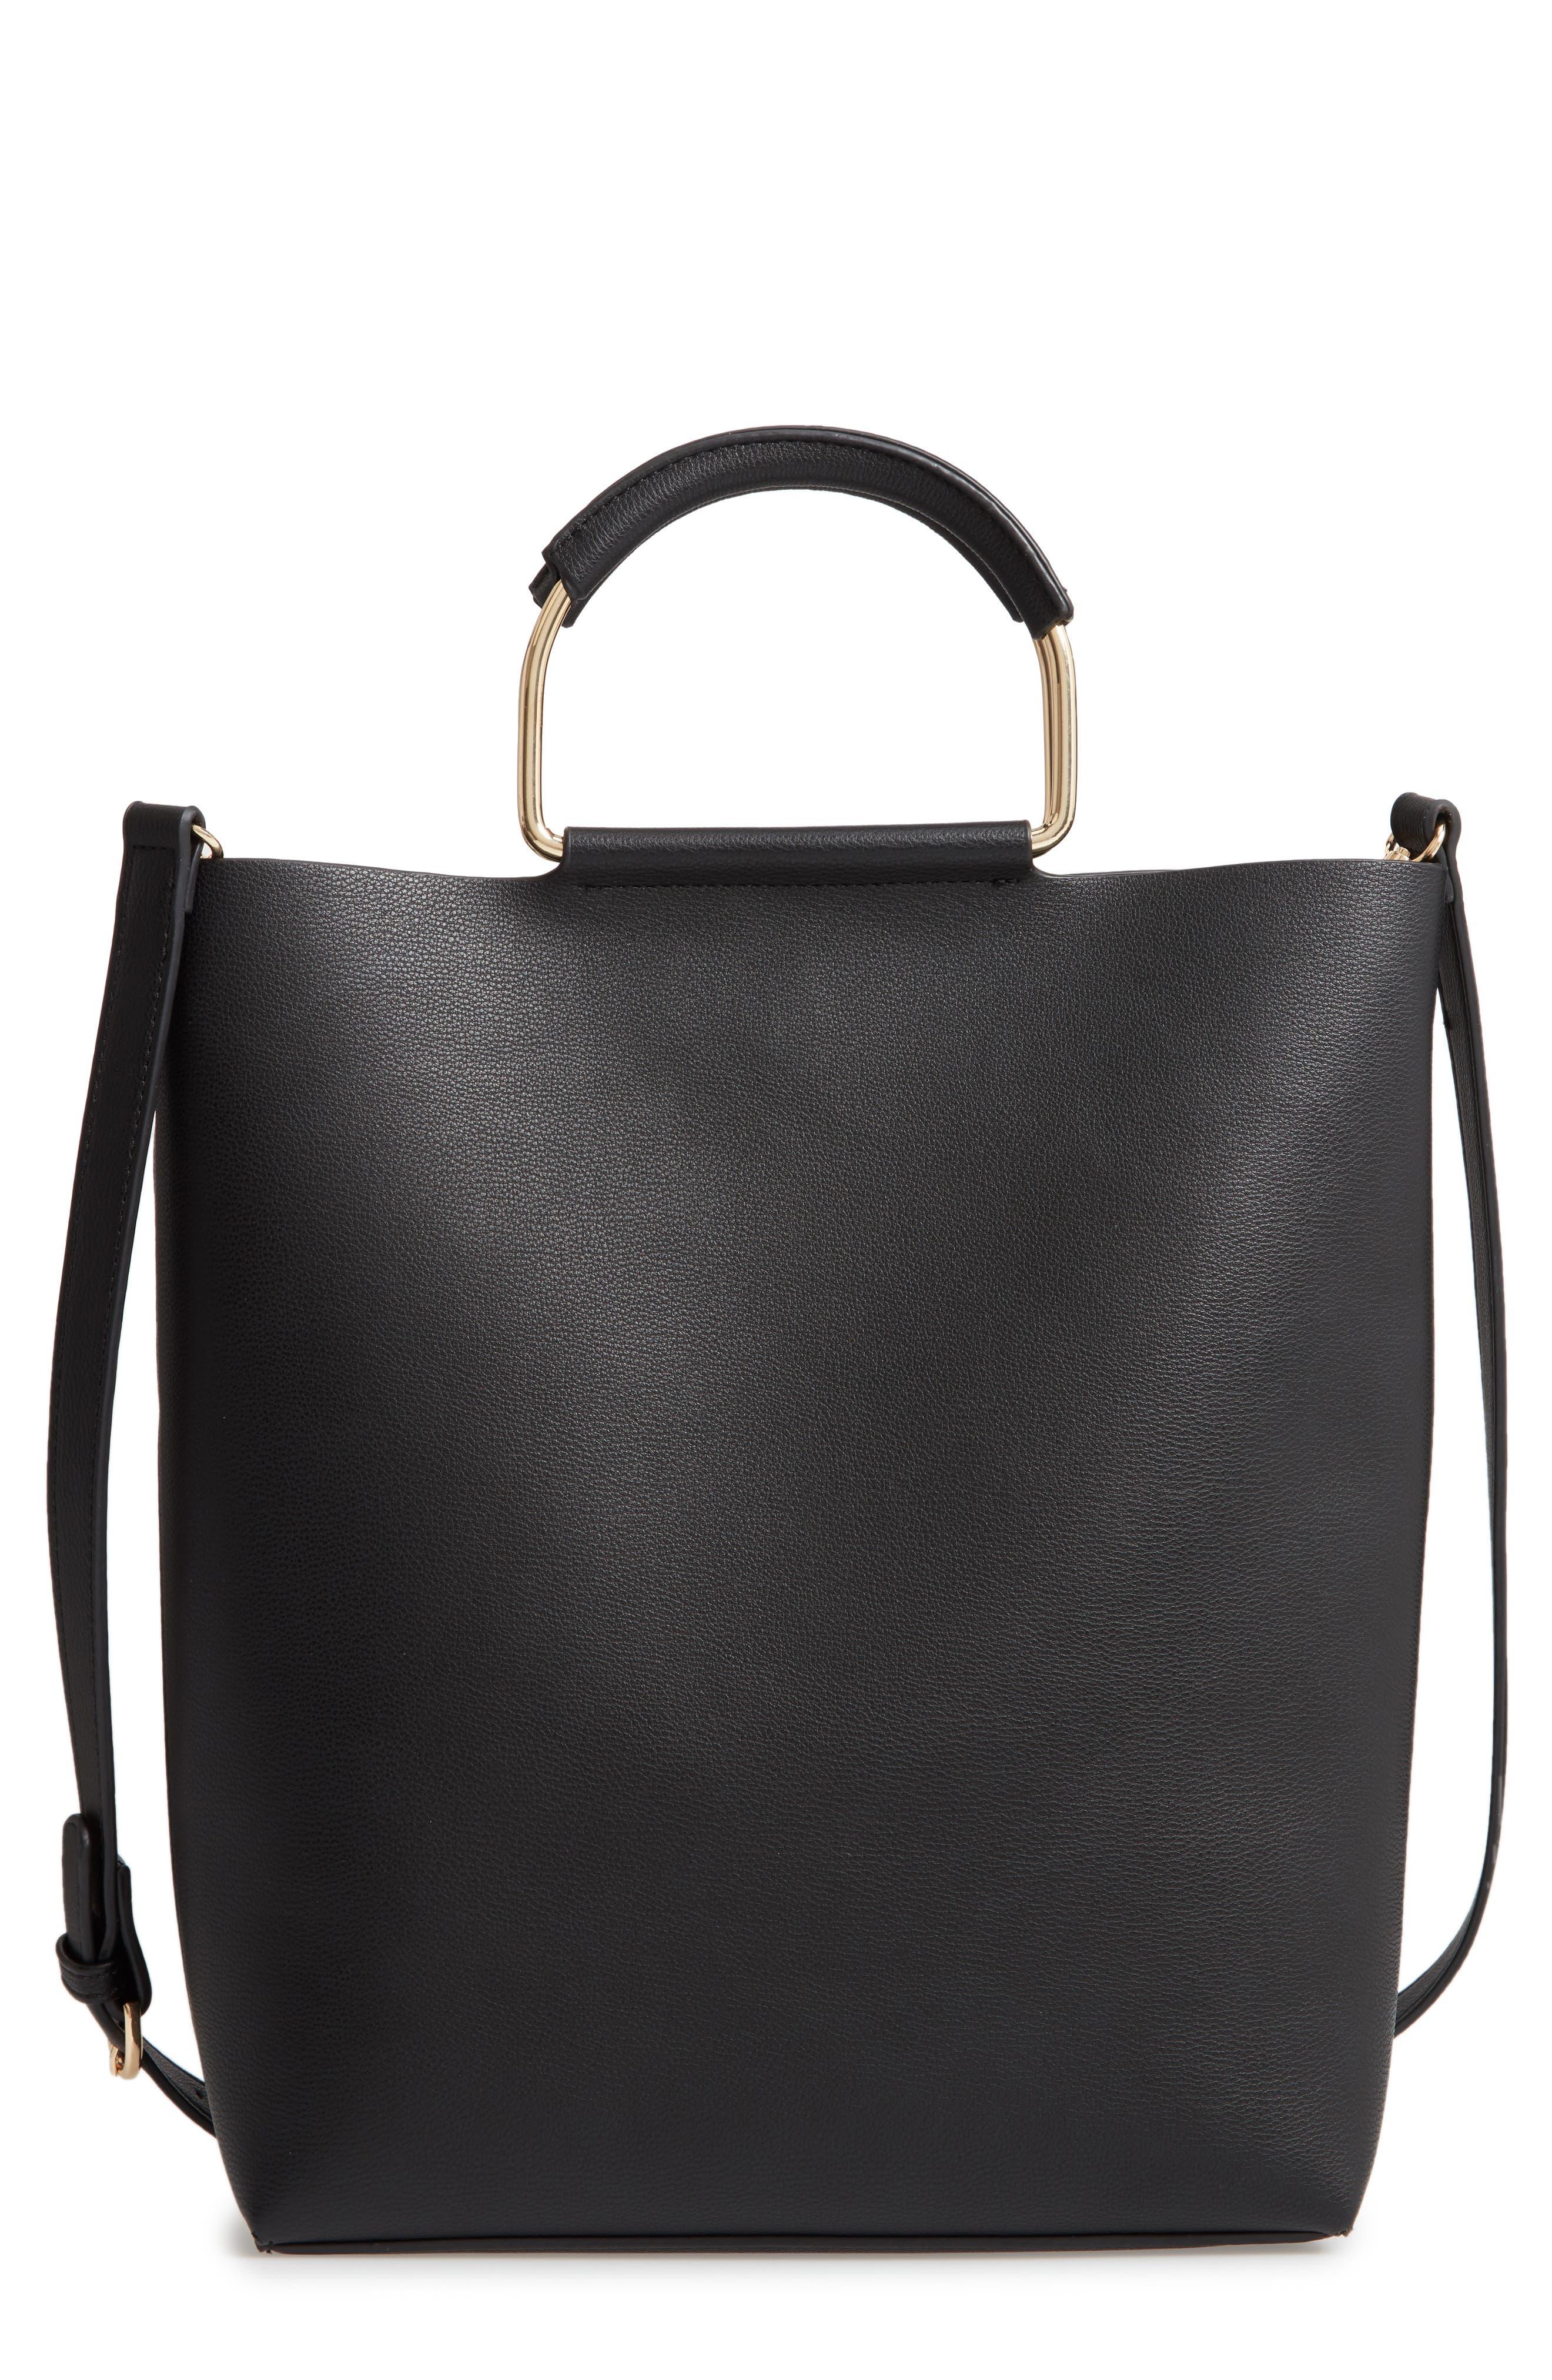 CHELSEA28 Payton Convertible Faux Leather Tote, Main, color, BLACK